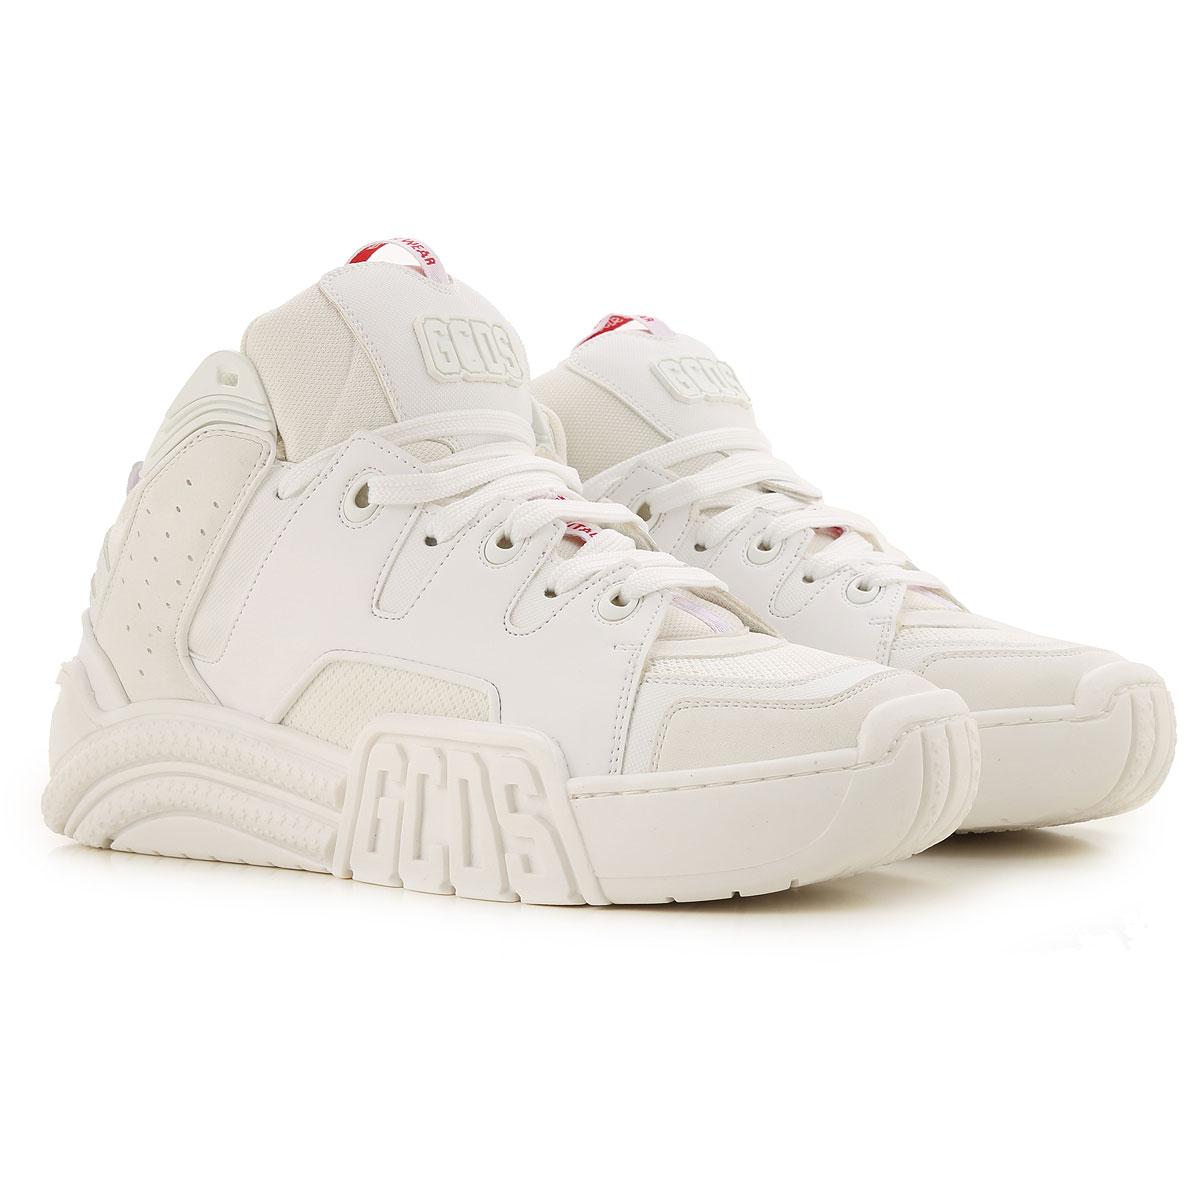 GCDS Sneaker Homme, Blanc, Textile, 2019, 39.5 40 40.5 41 41.5 42 42.5 43 43.5 44